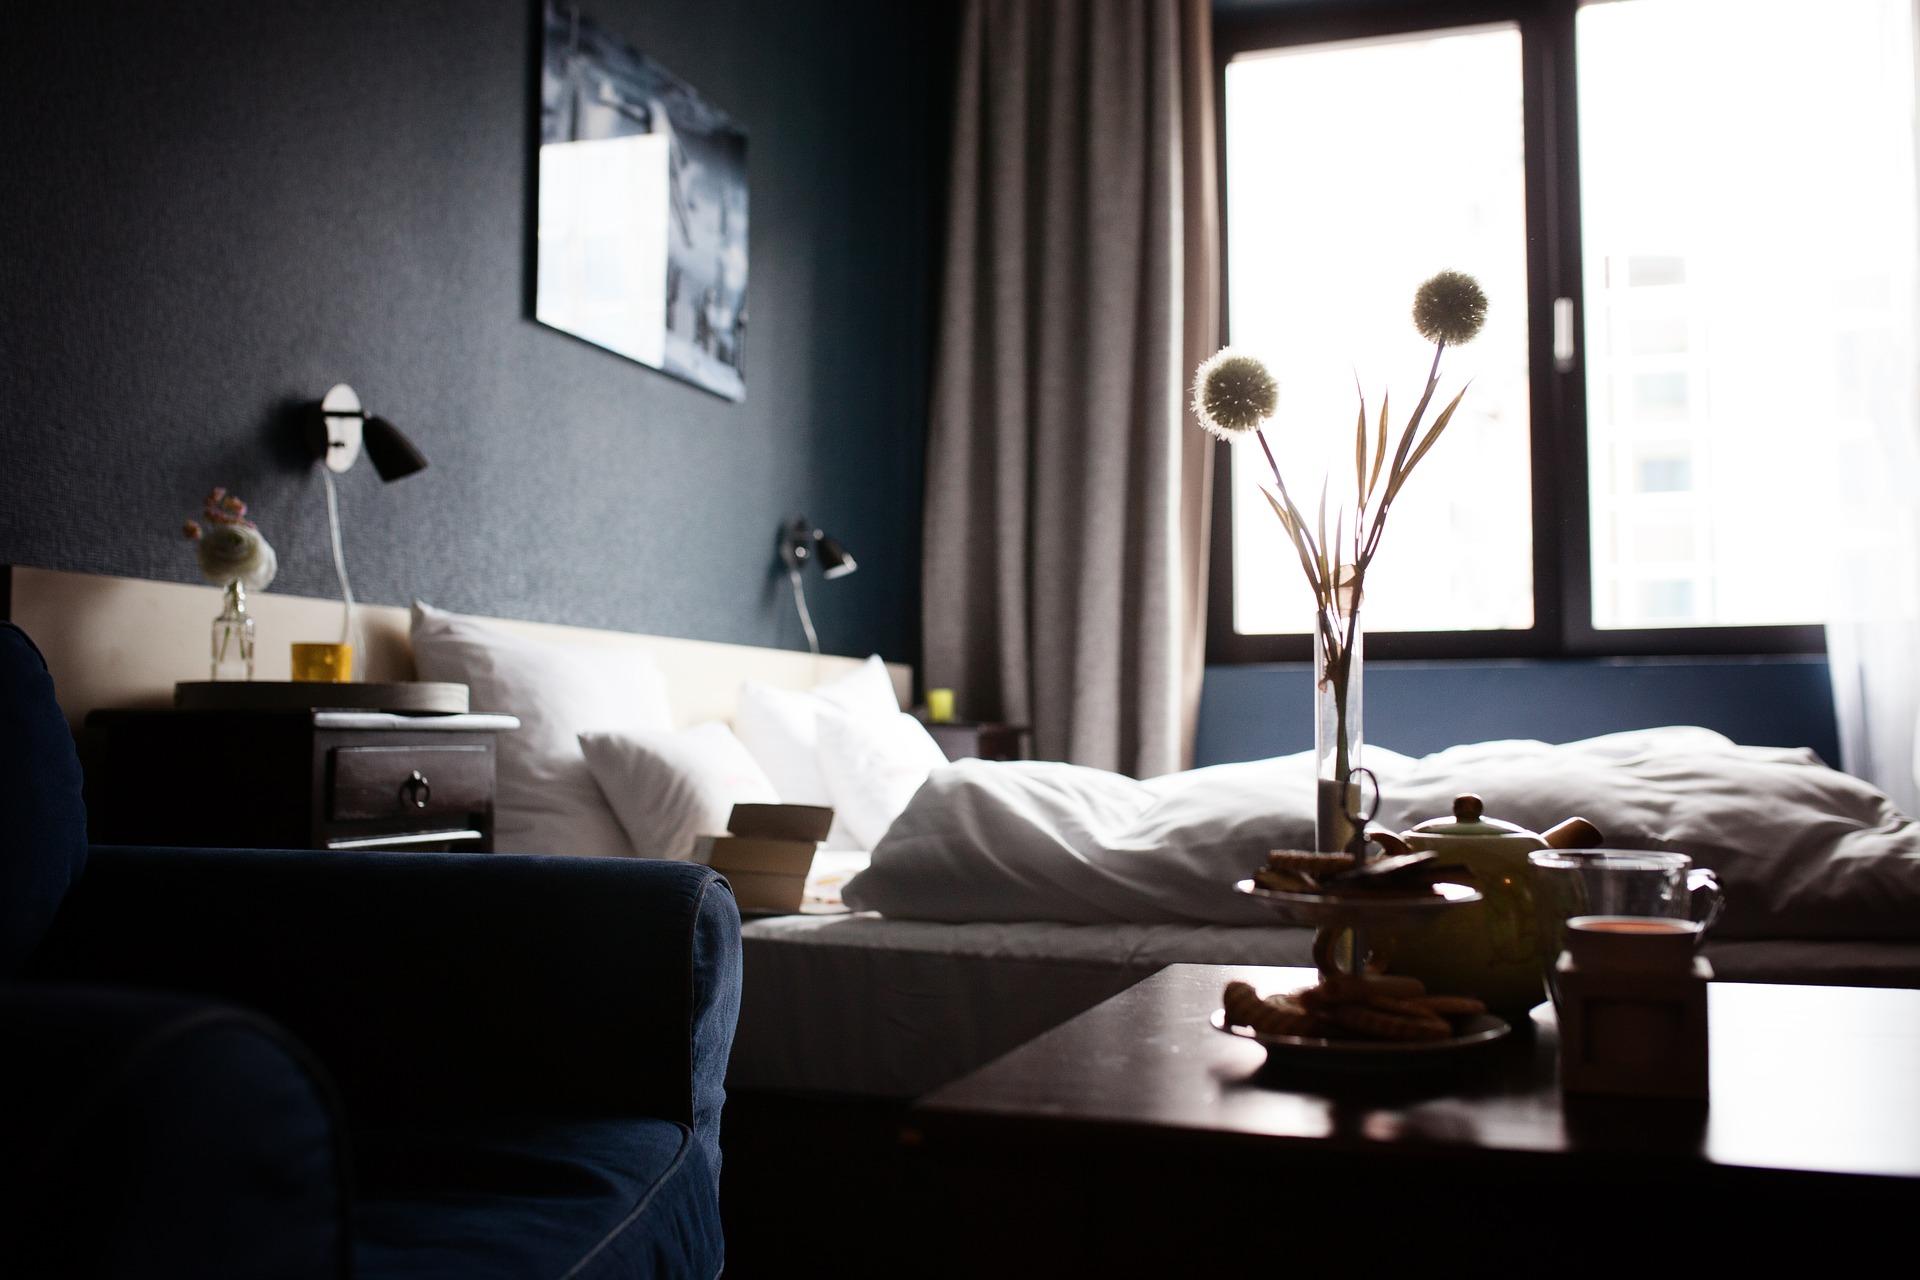 hotel-1749602_1920.jpg